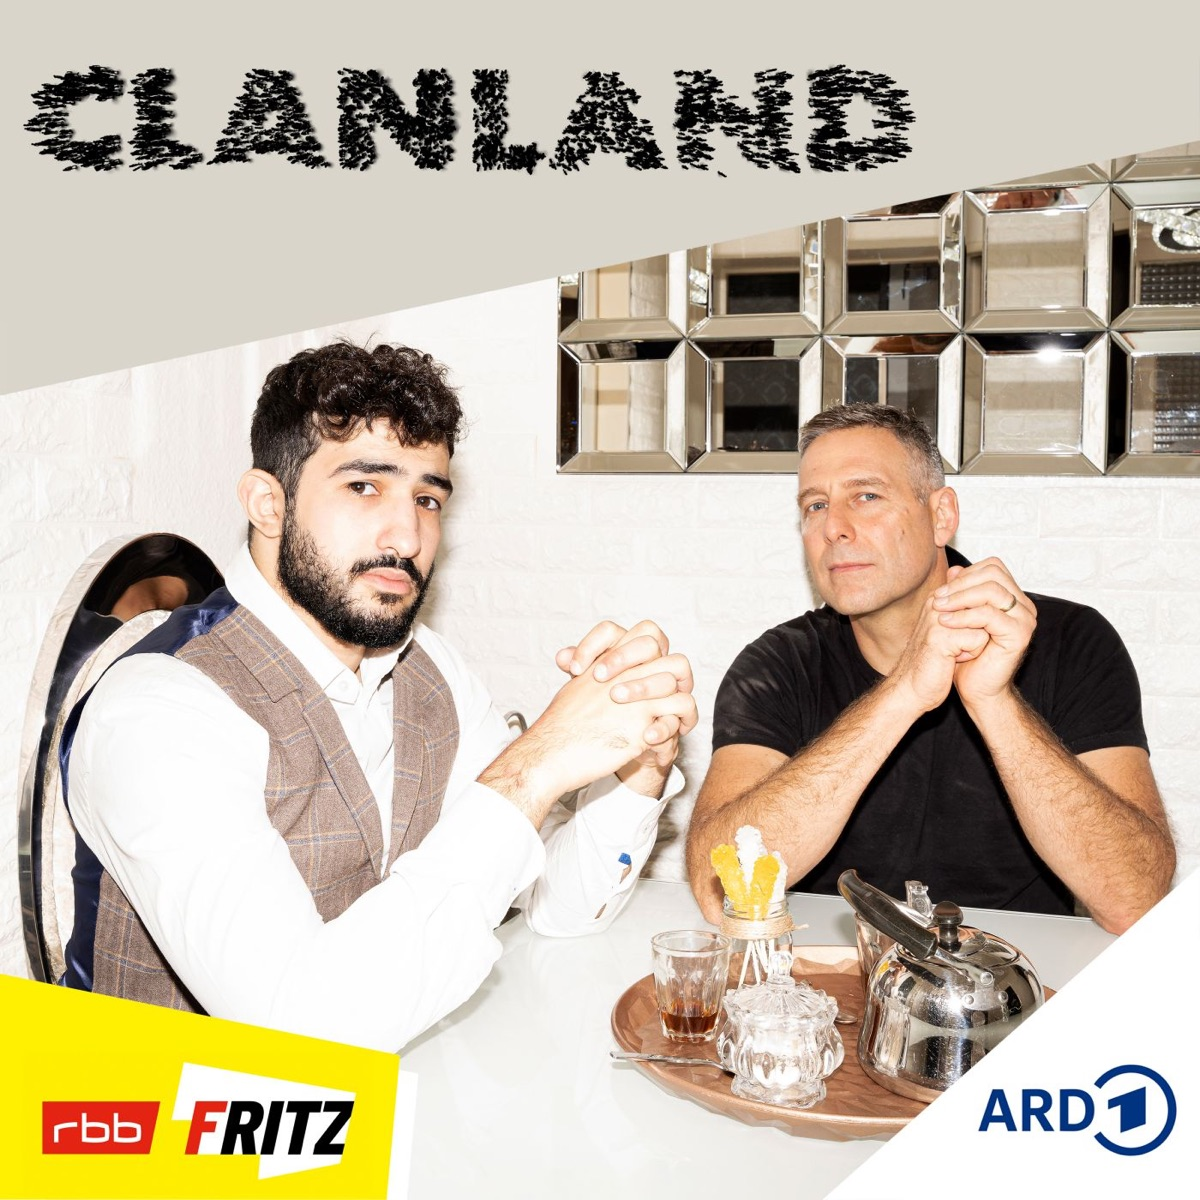 Clanland